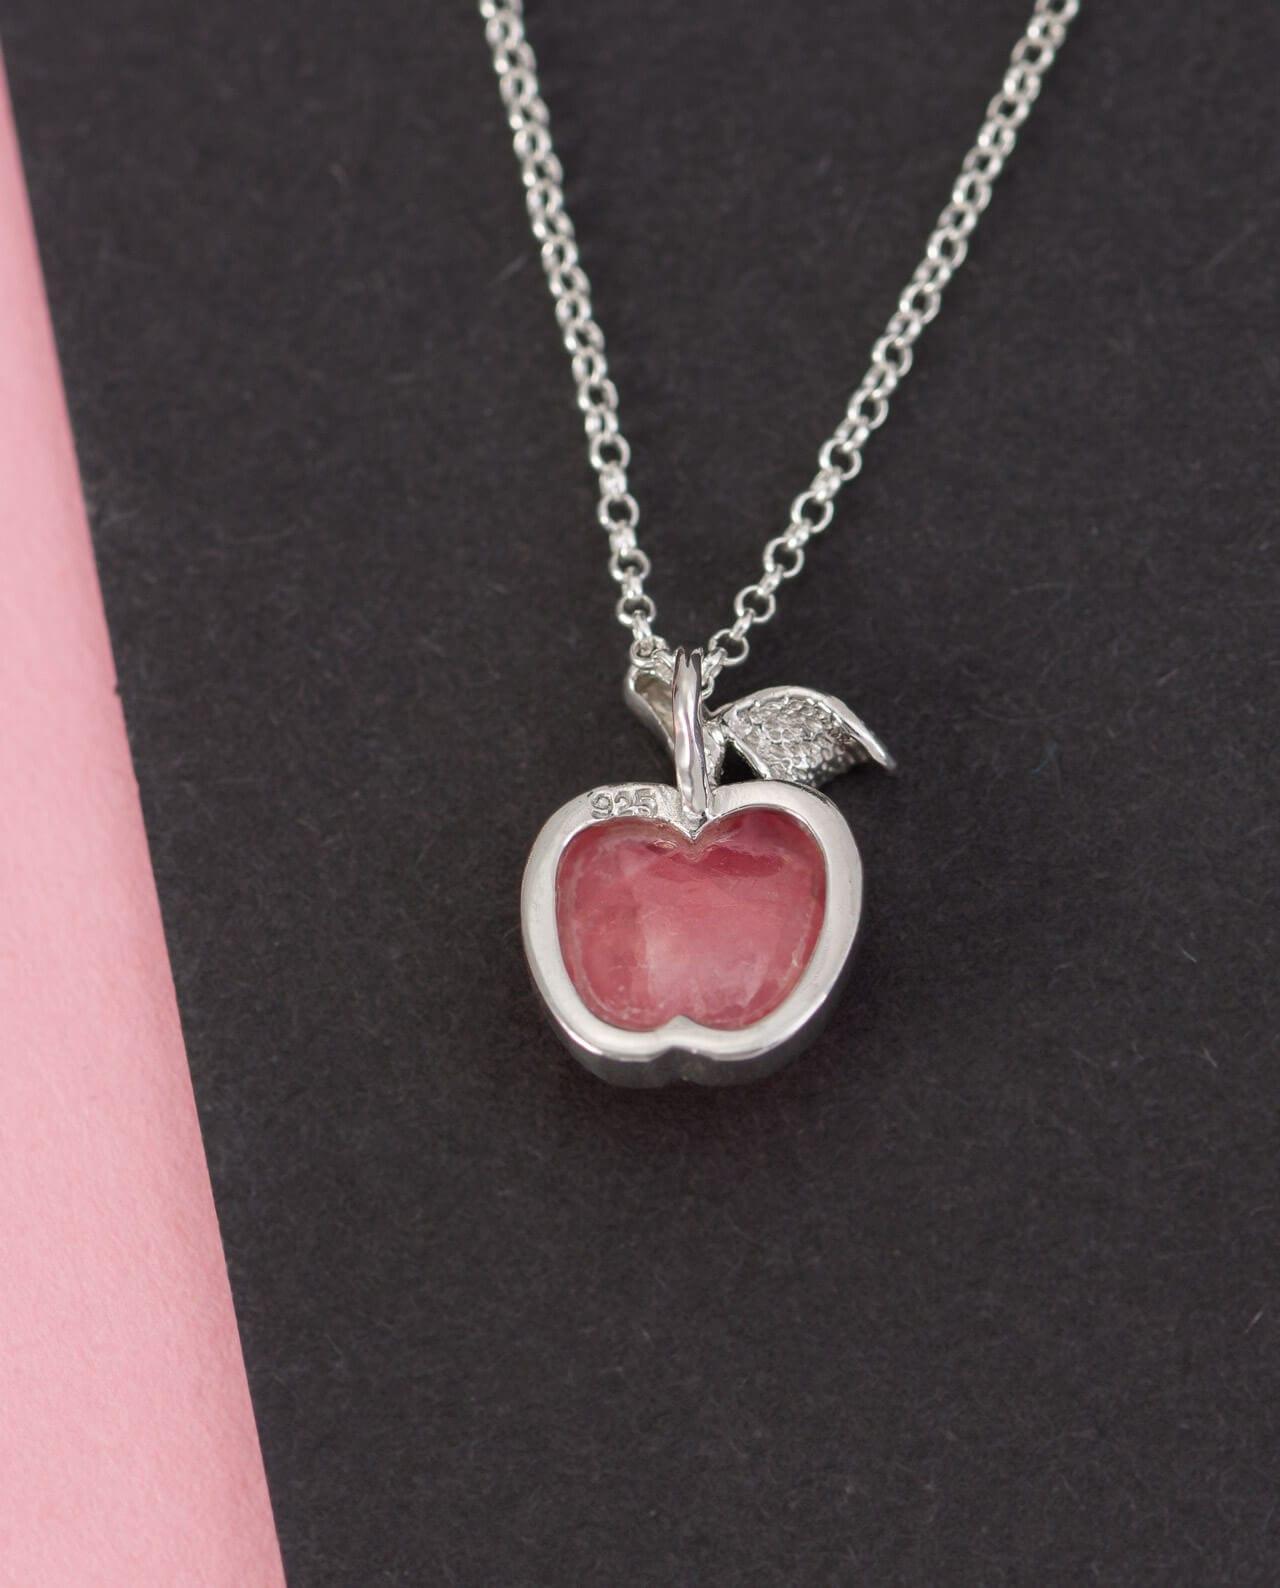 CONLIGHT Rhodochrosit Silber Anheanger Apfel